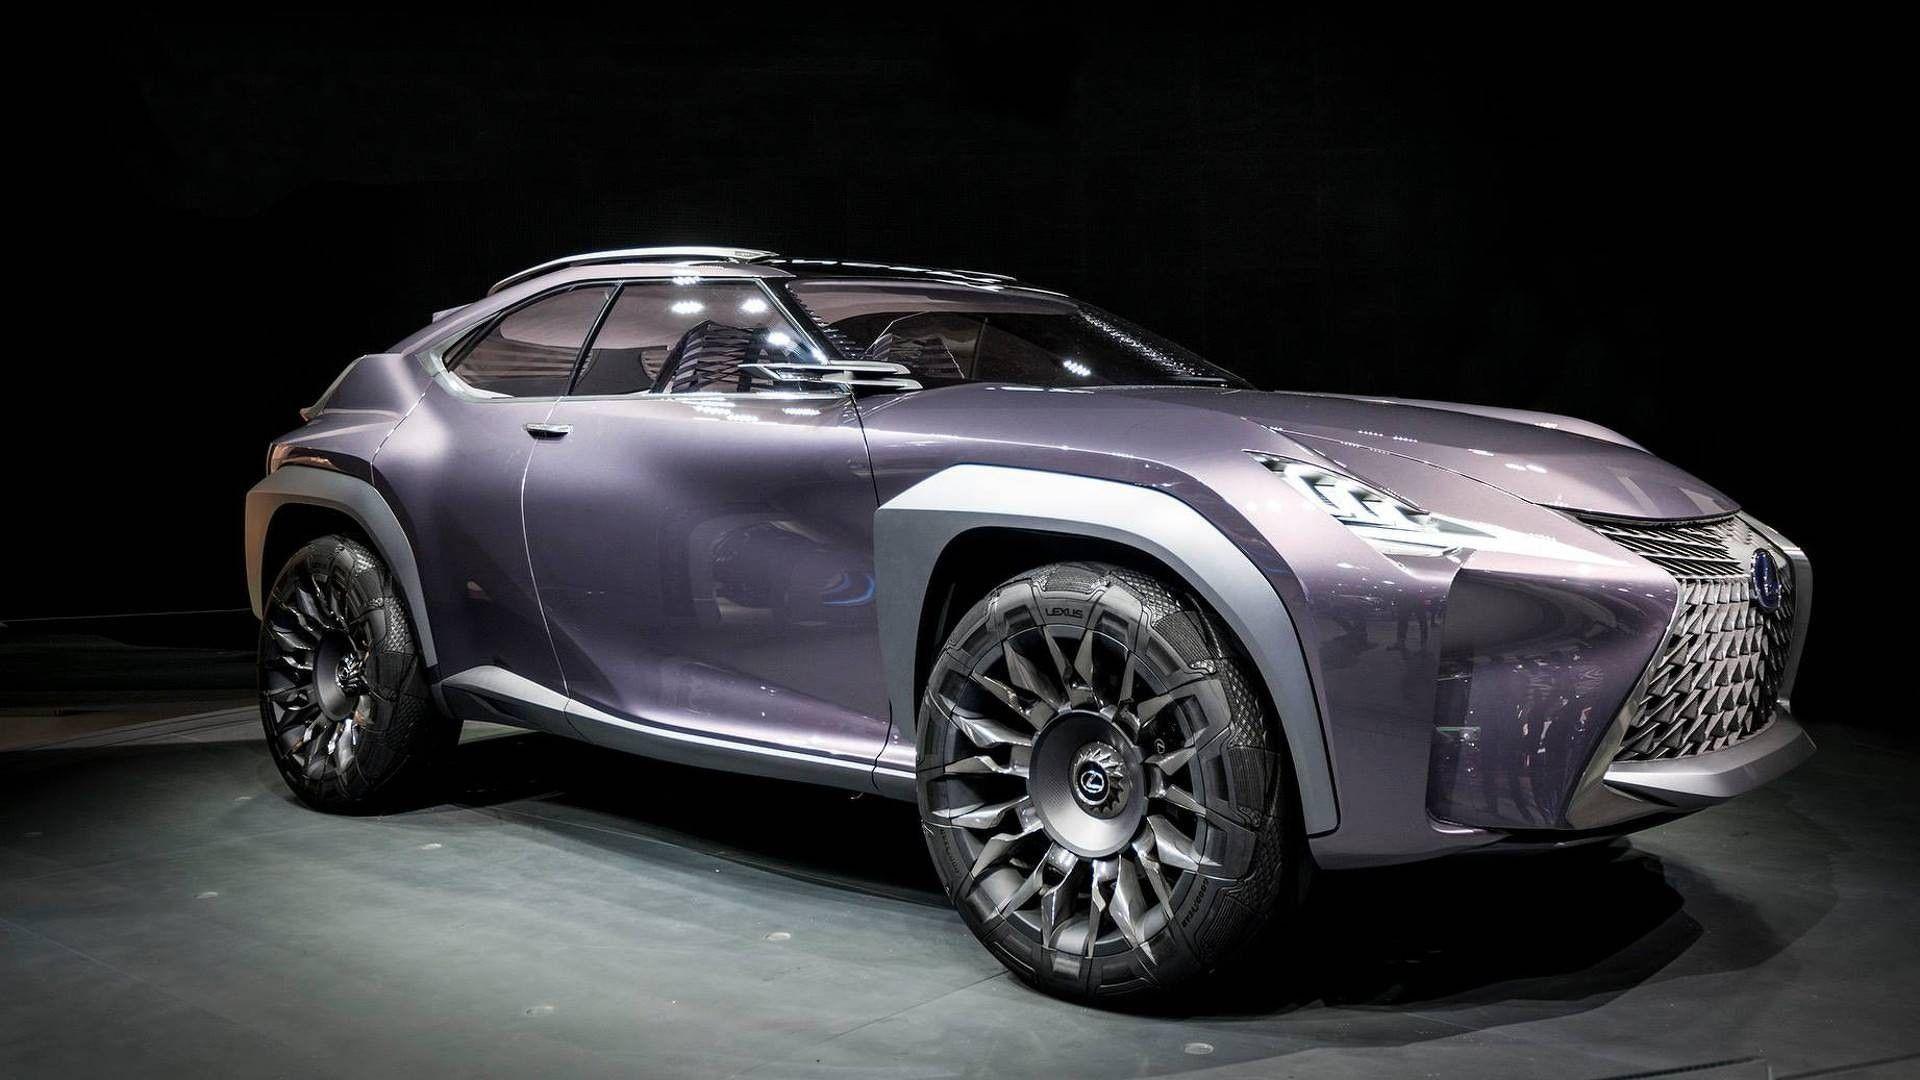 2019 Vehicles Interior, Exterior and Review Car, Car